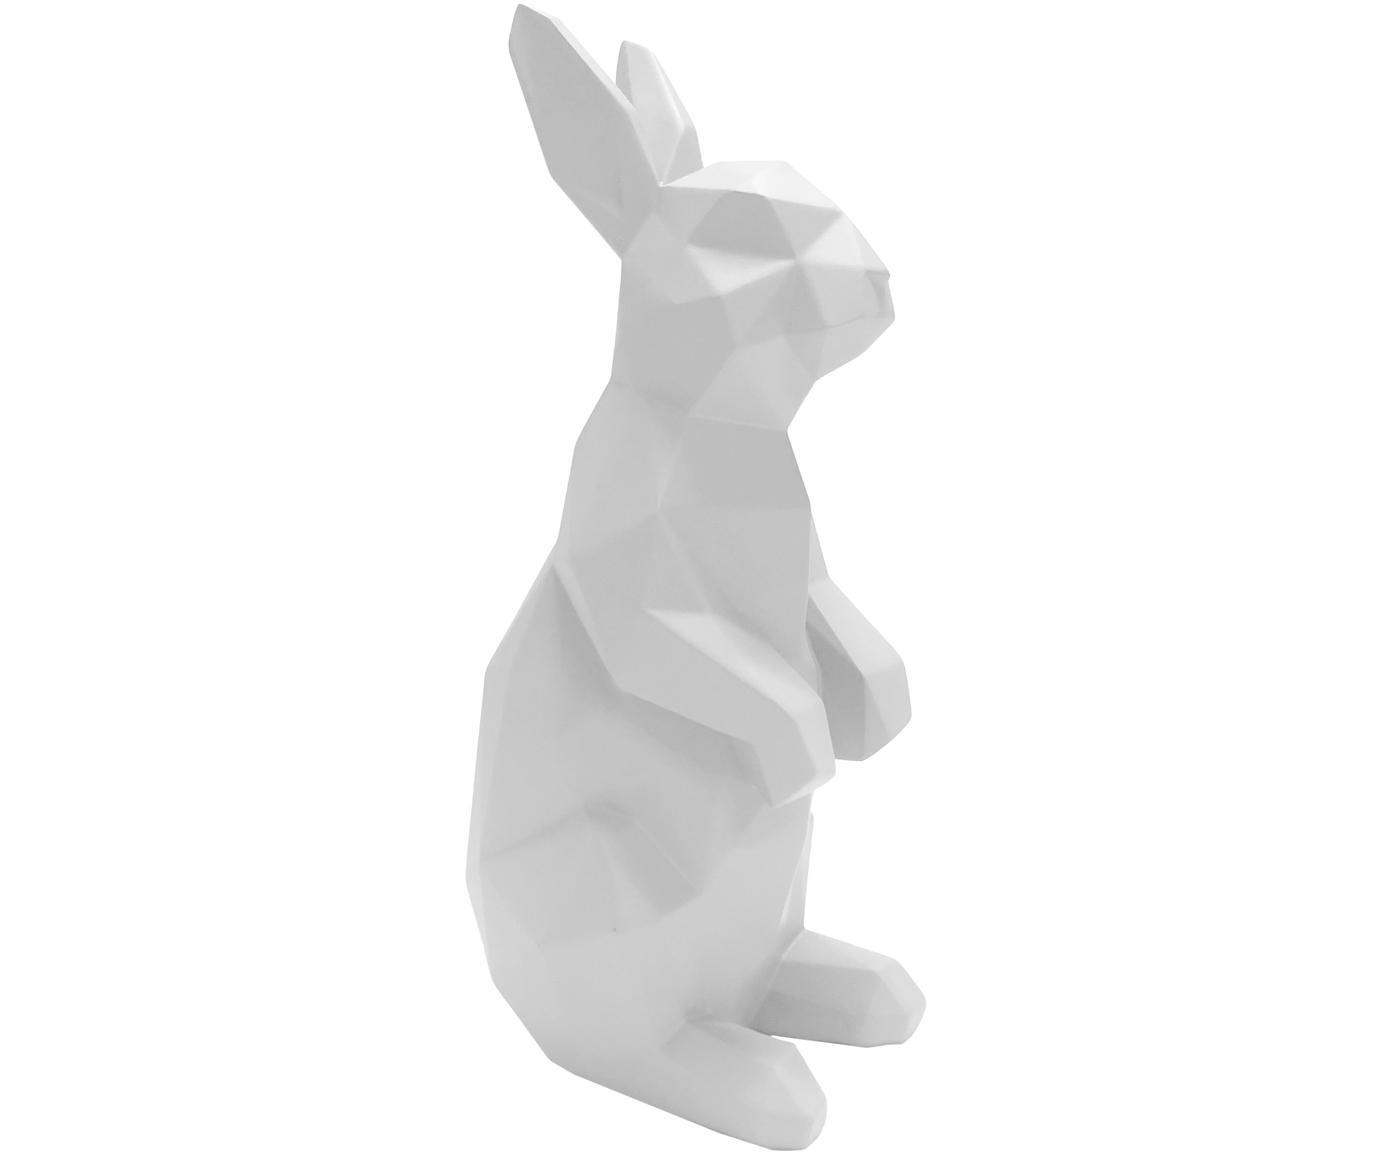 Oggetto decorativo Origami Bunny, Poliresina, Bianco, Larg. 25 x Alt. 13 cm